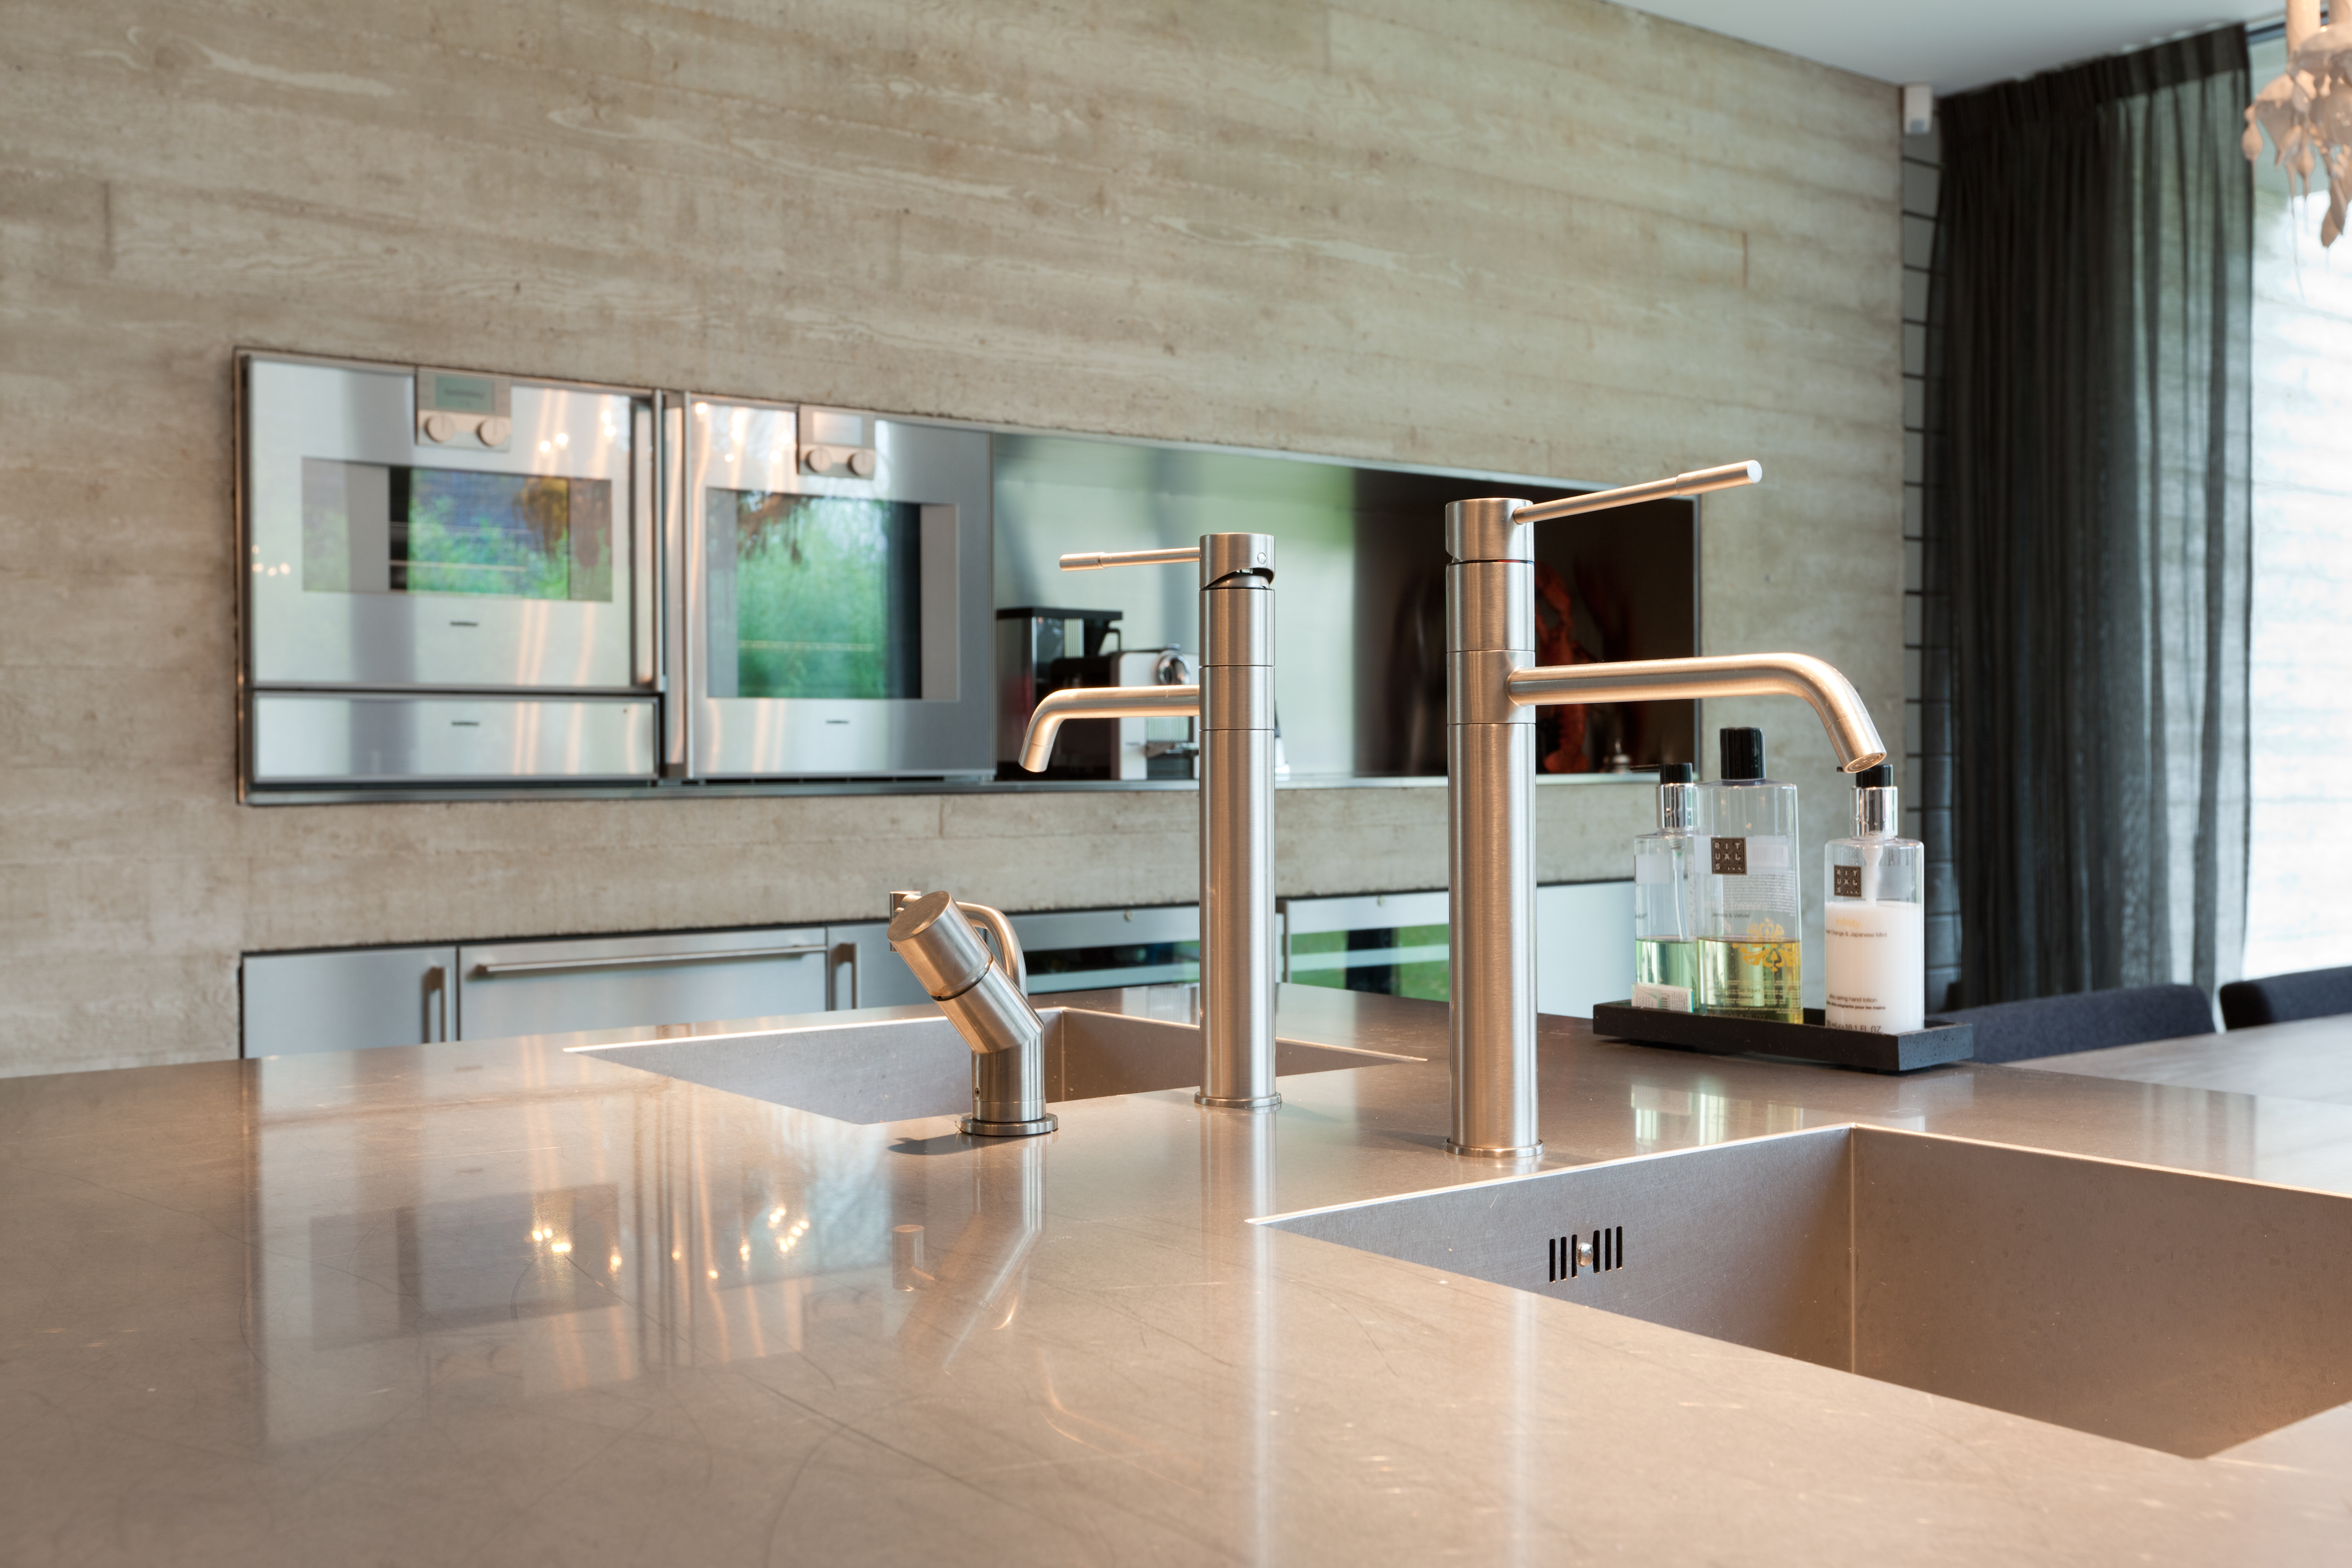 Rvs Design Keuken : Design keukens aswa keukens